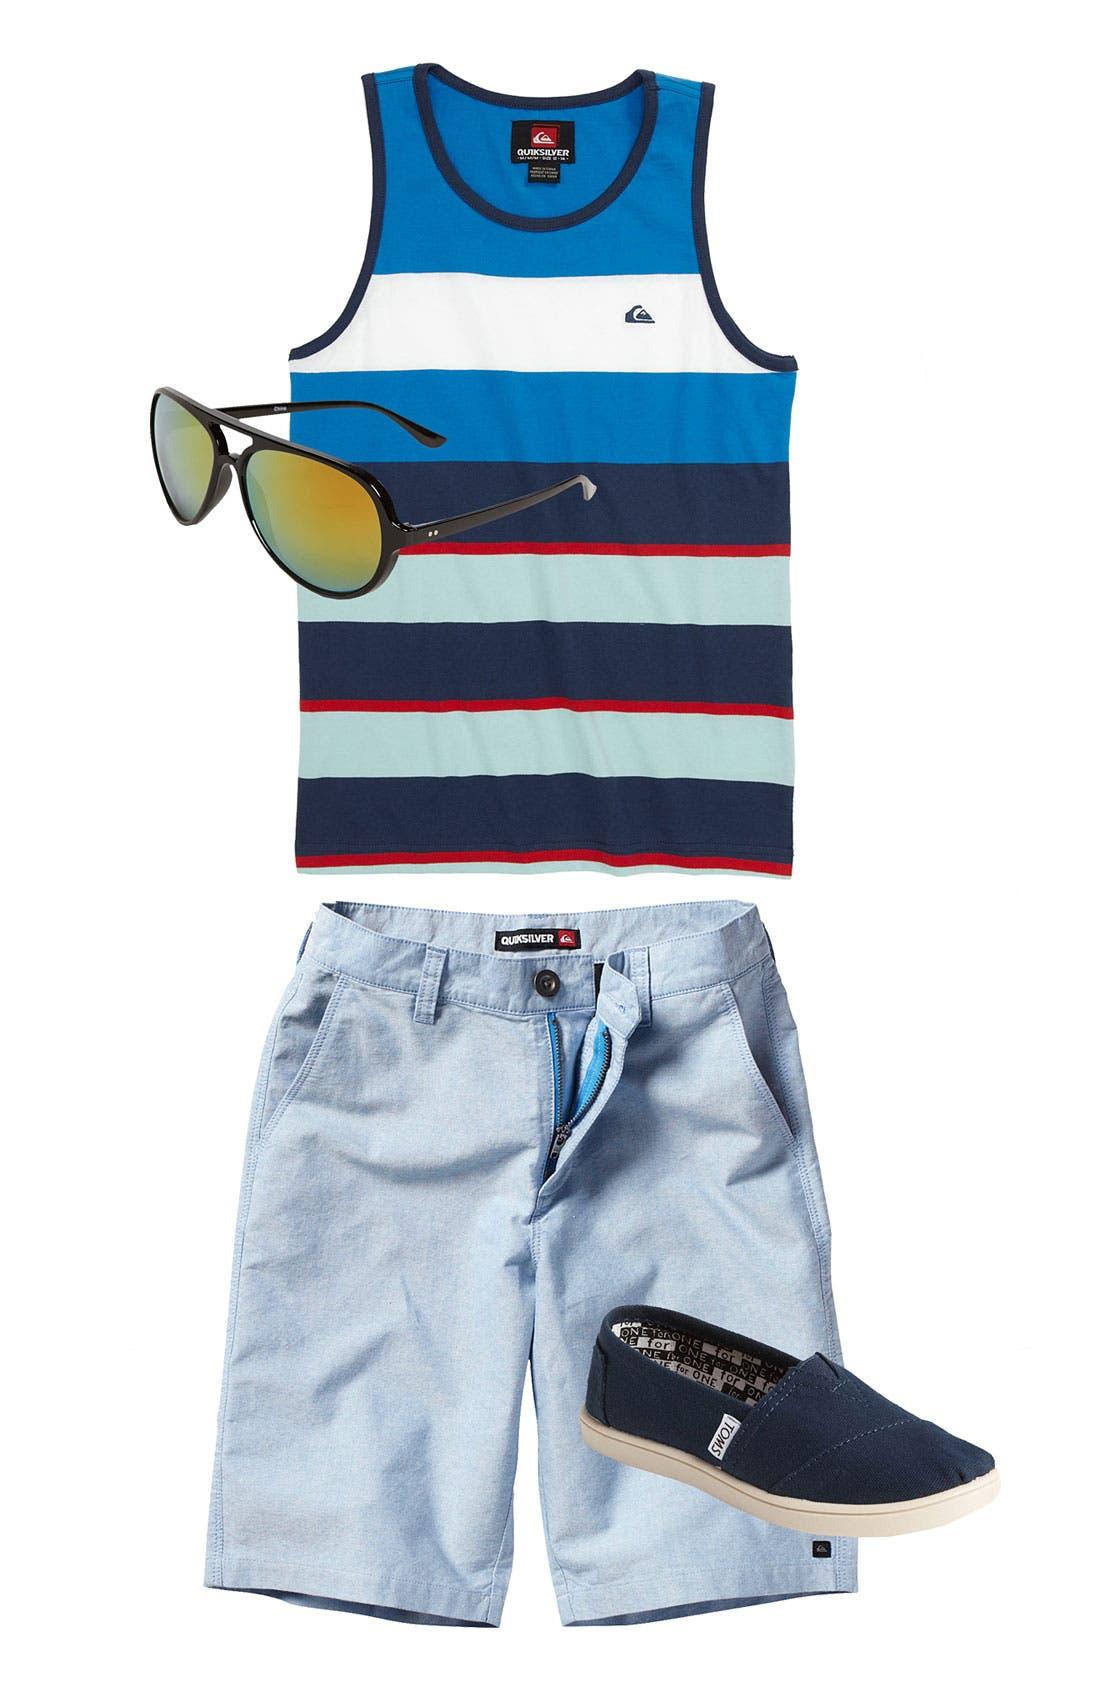 Main Image - Quiksilver Shirt & Shorts & Icon Eyewear Sunglasses (Big Boys)